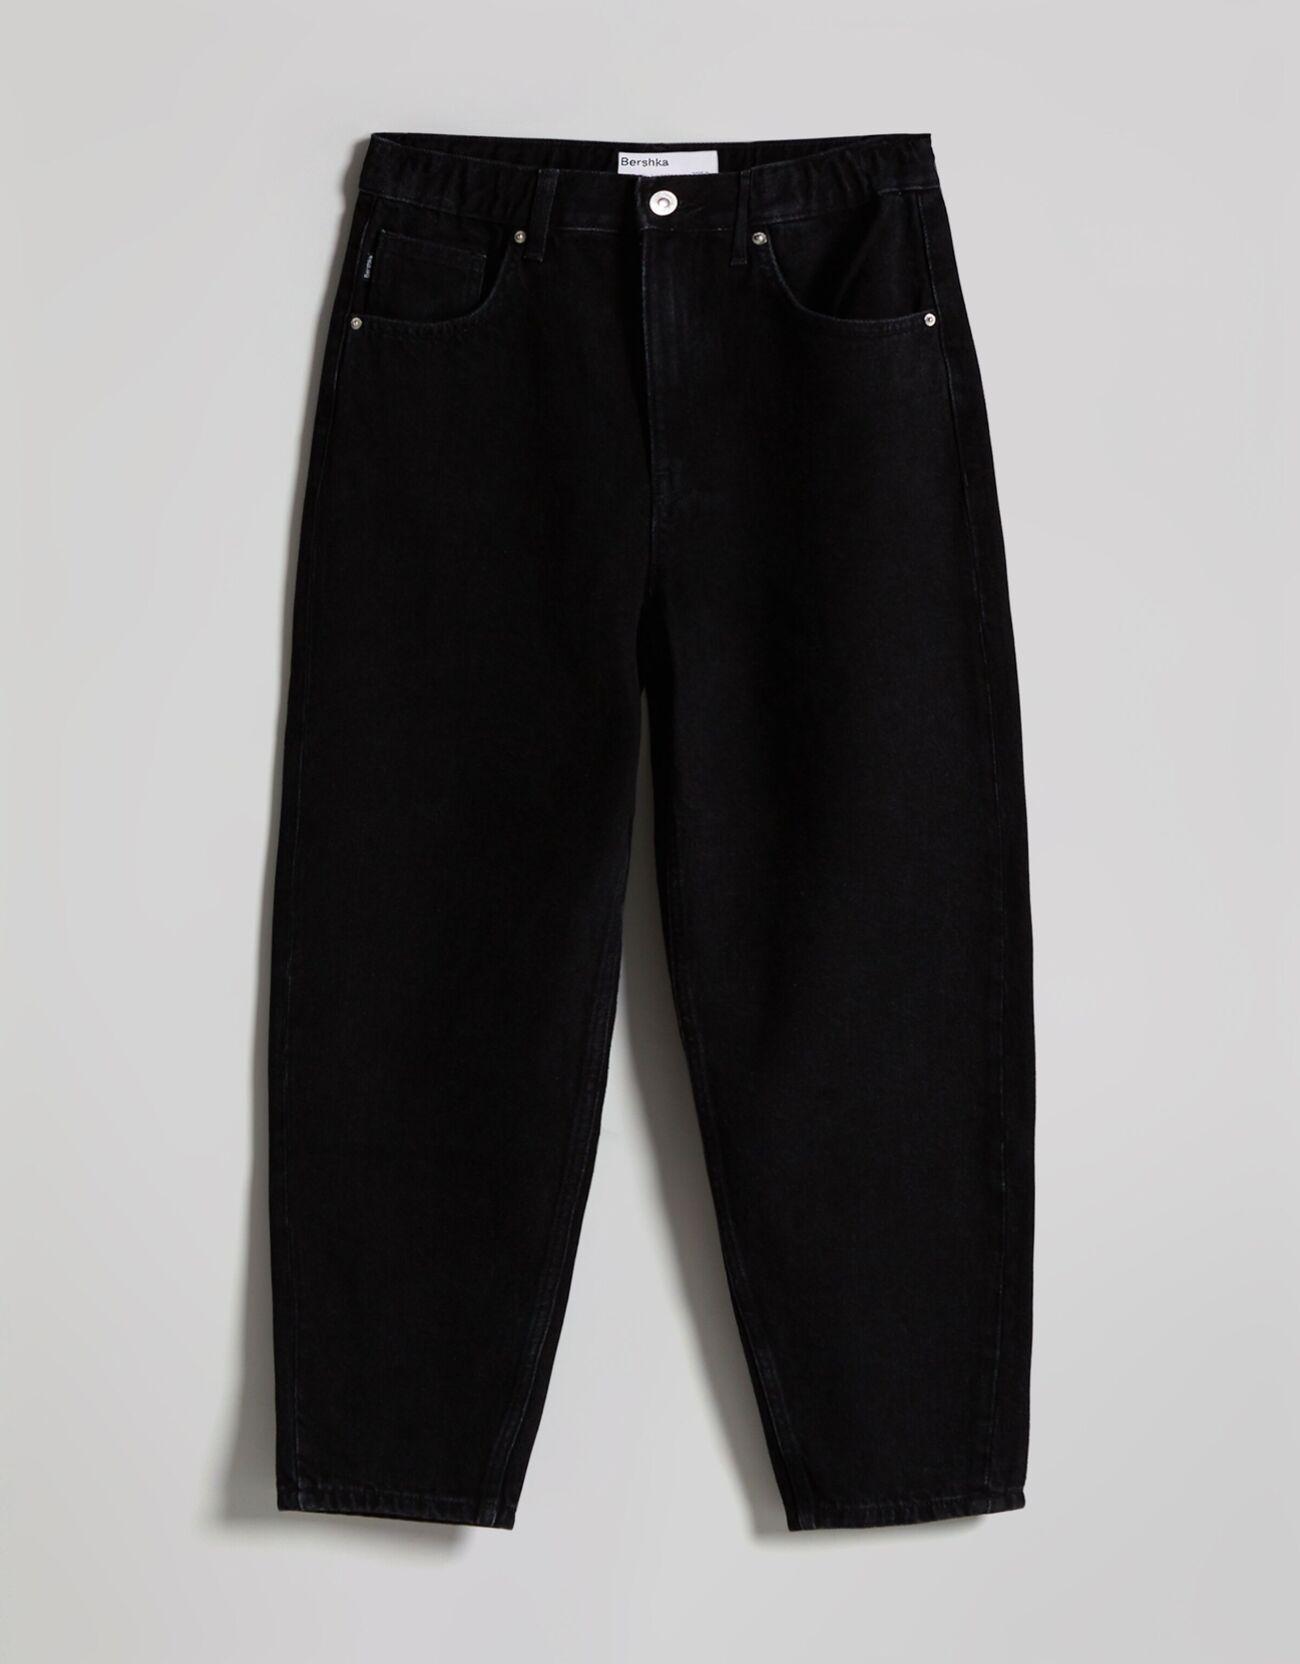 Jeans balloon negros